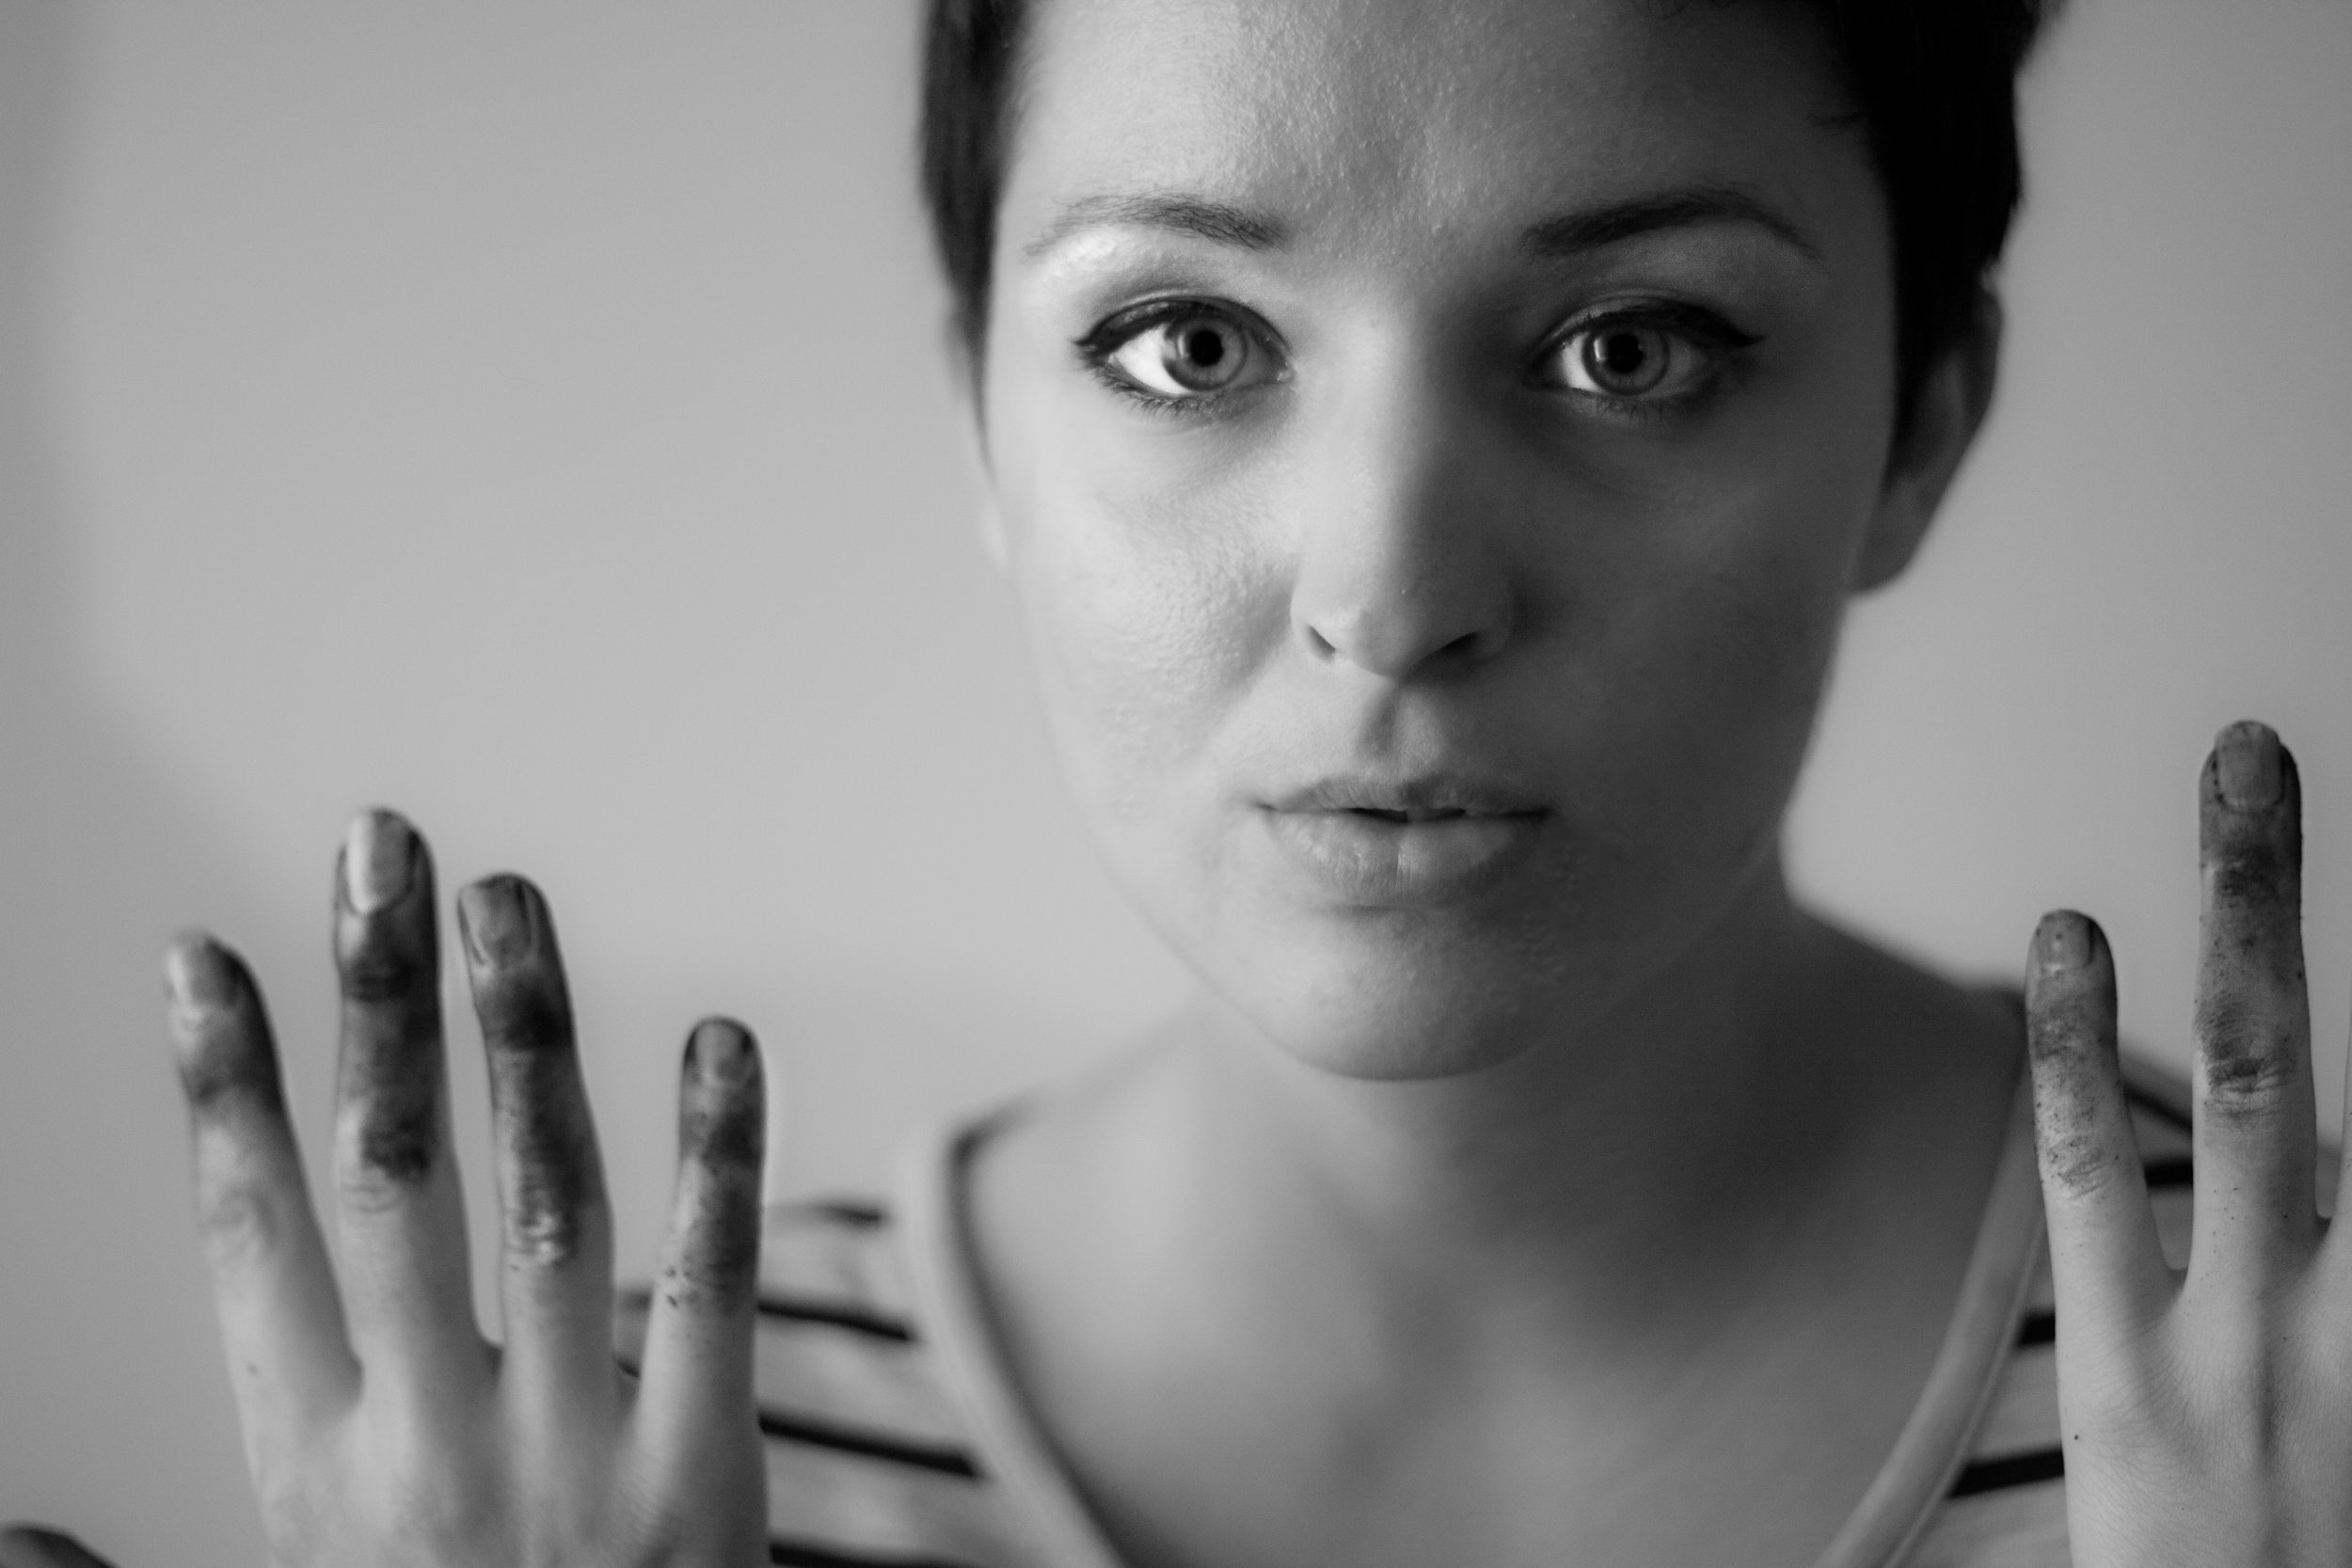 creative-personal-portraits-katy-daixon-photography9.jpg